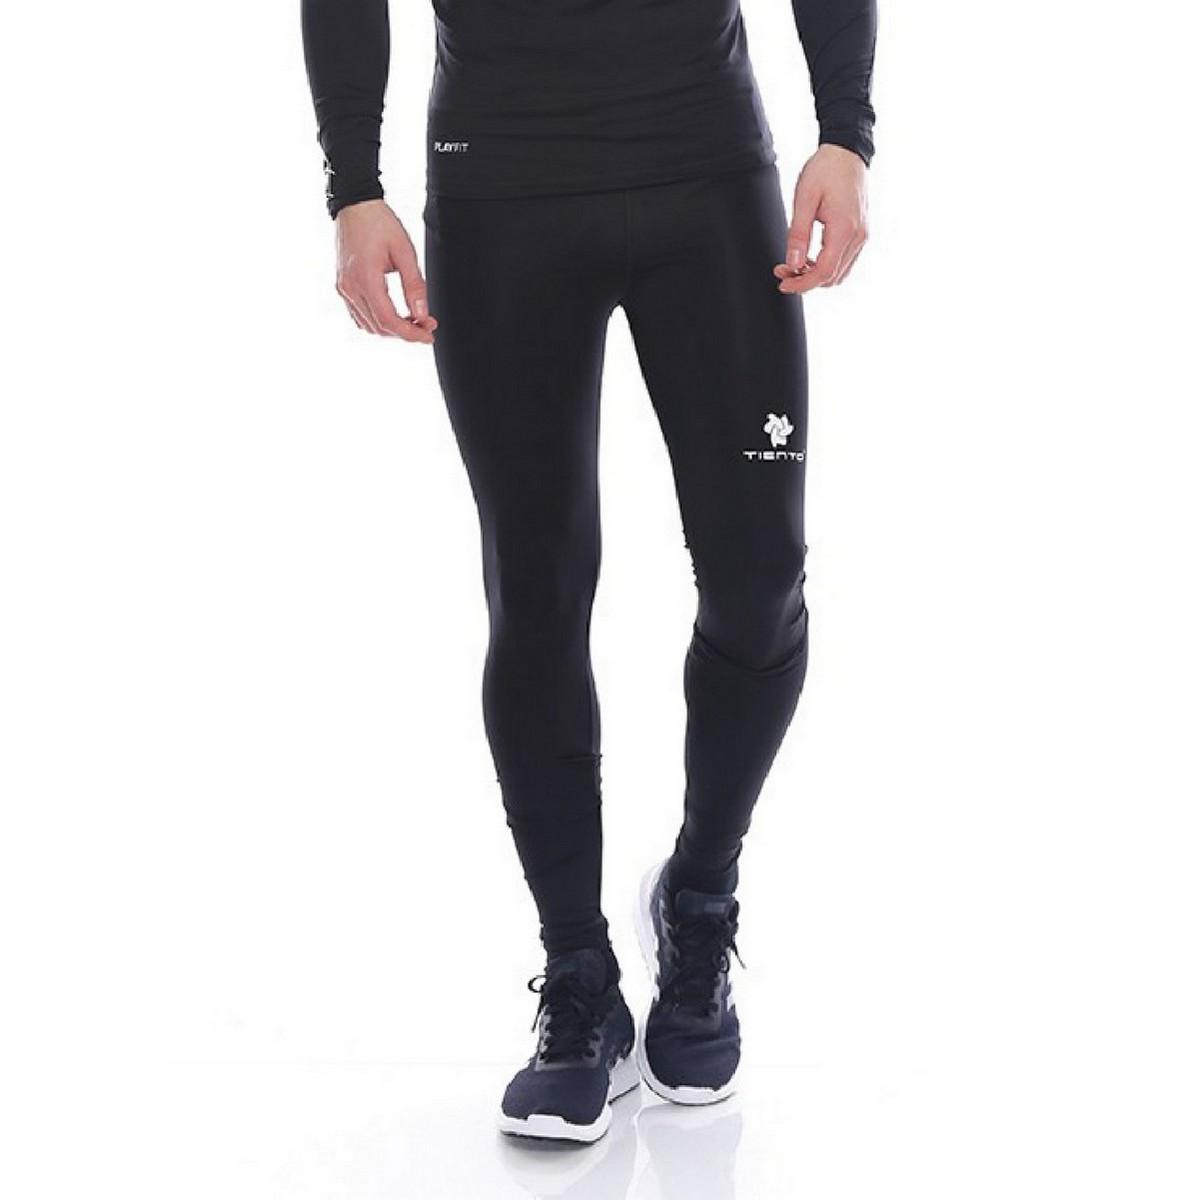 Jual Celana Panjang Pendek Olahraga Pria Tiento Lazada Co Id